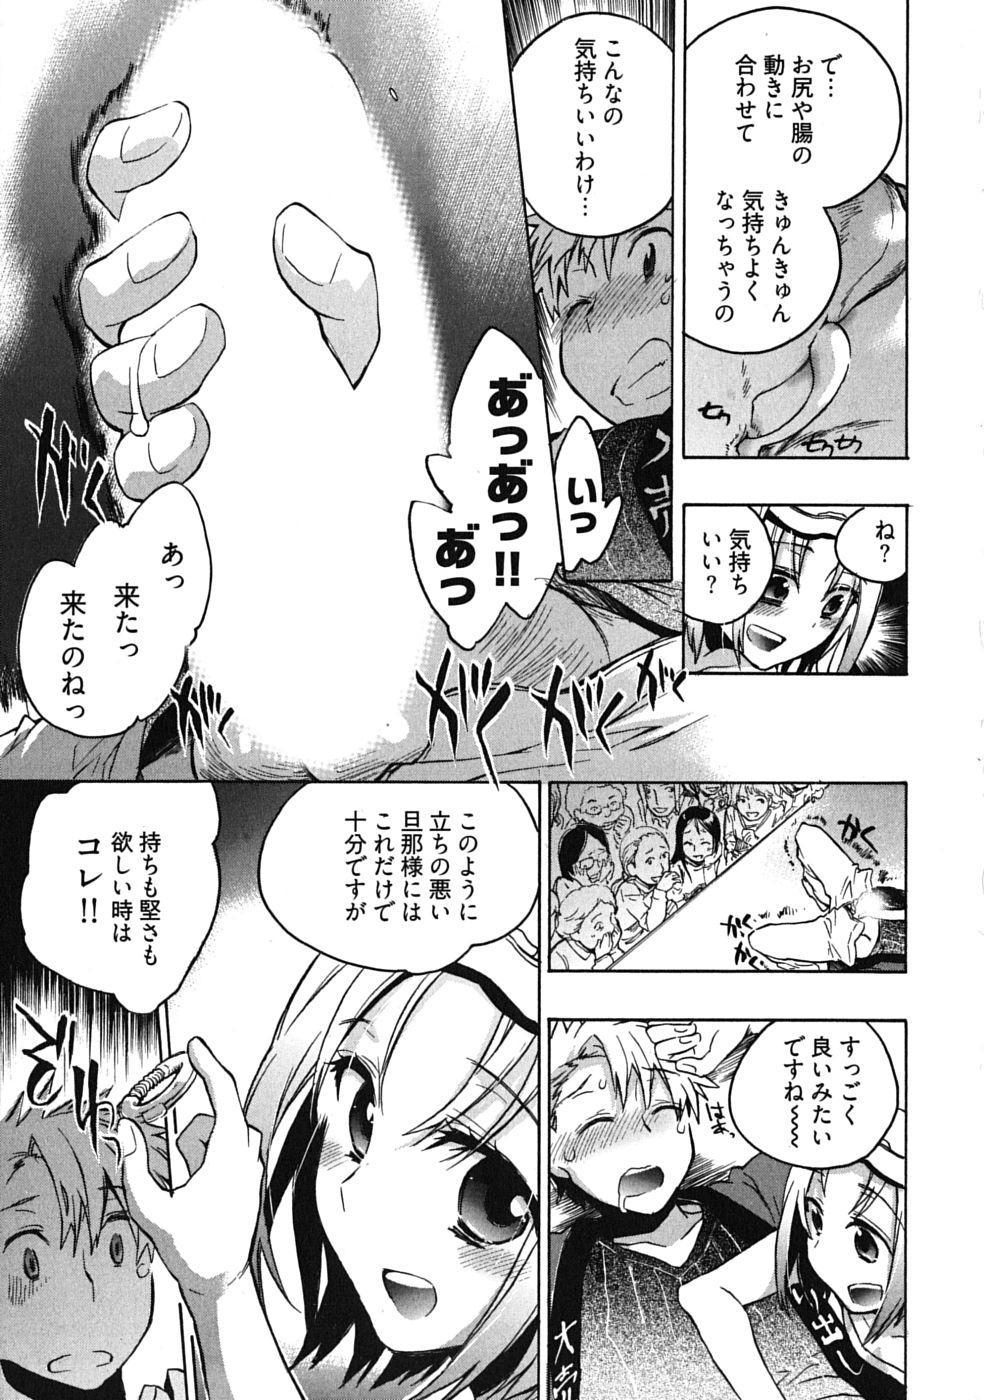 Omocha No Ohime-sama | La Princesse De Jouet Vol. 3 58